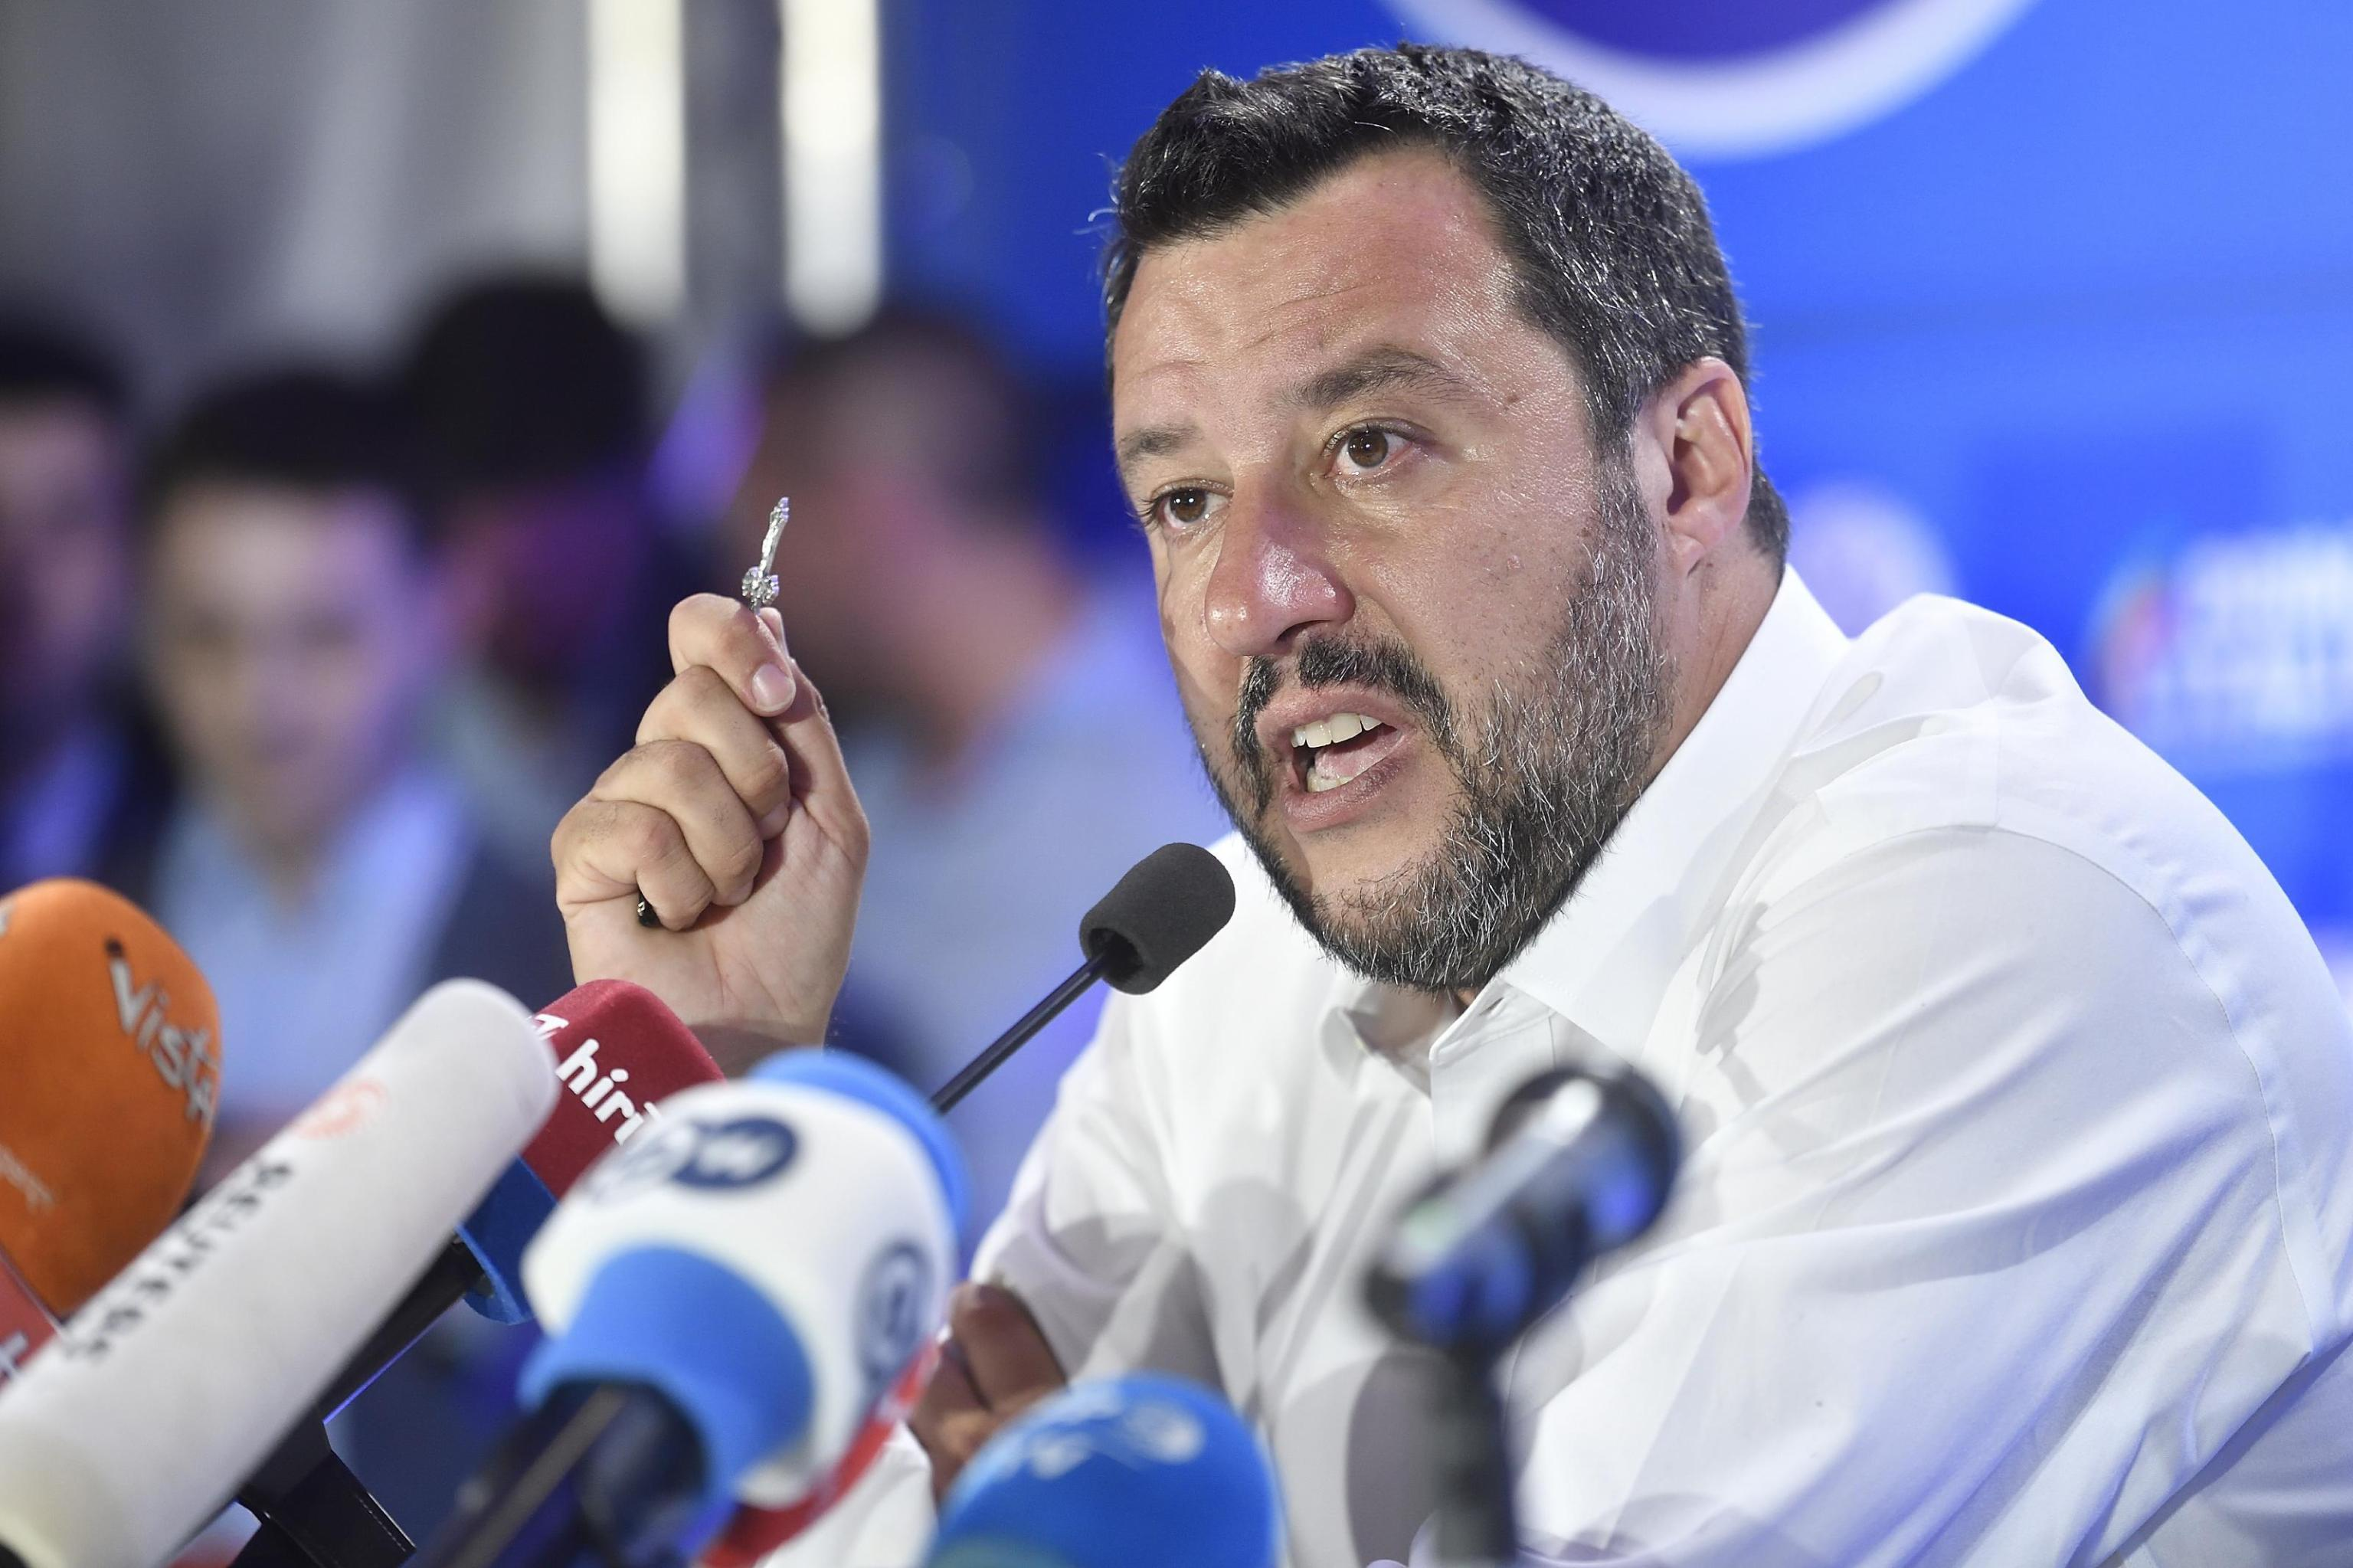 Europee, Salvini bacia il rosario